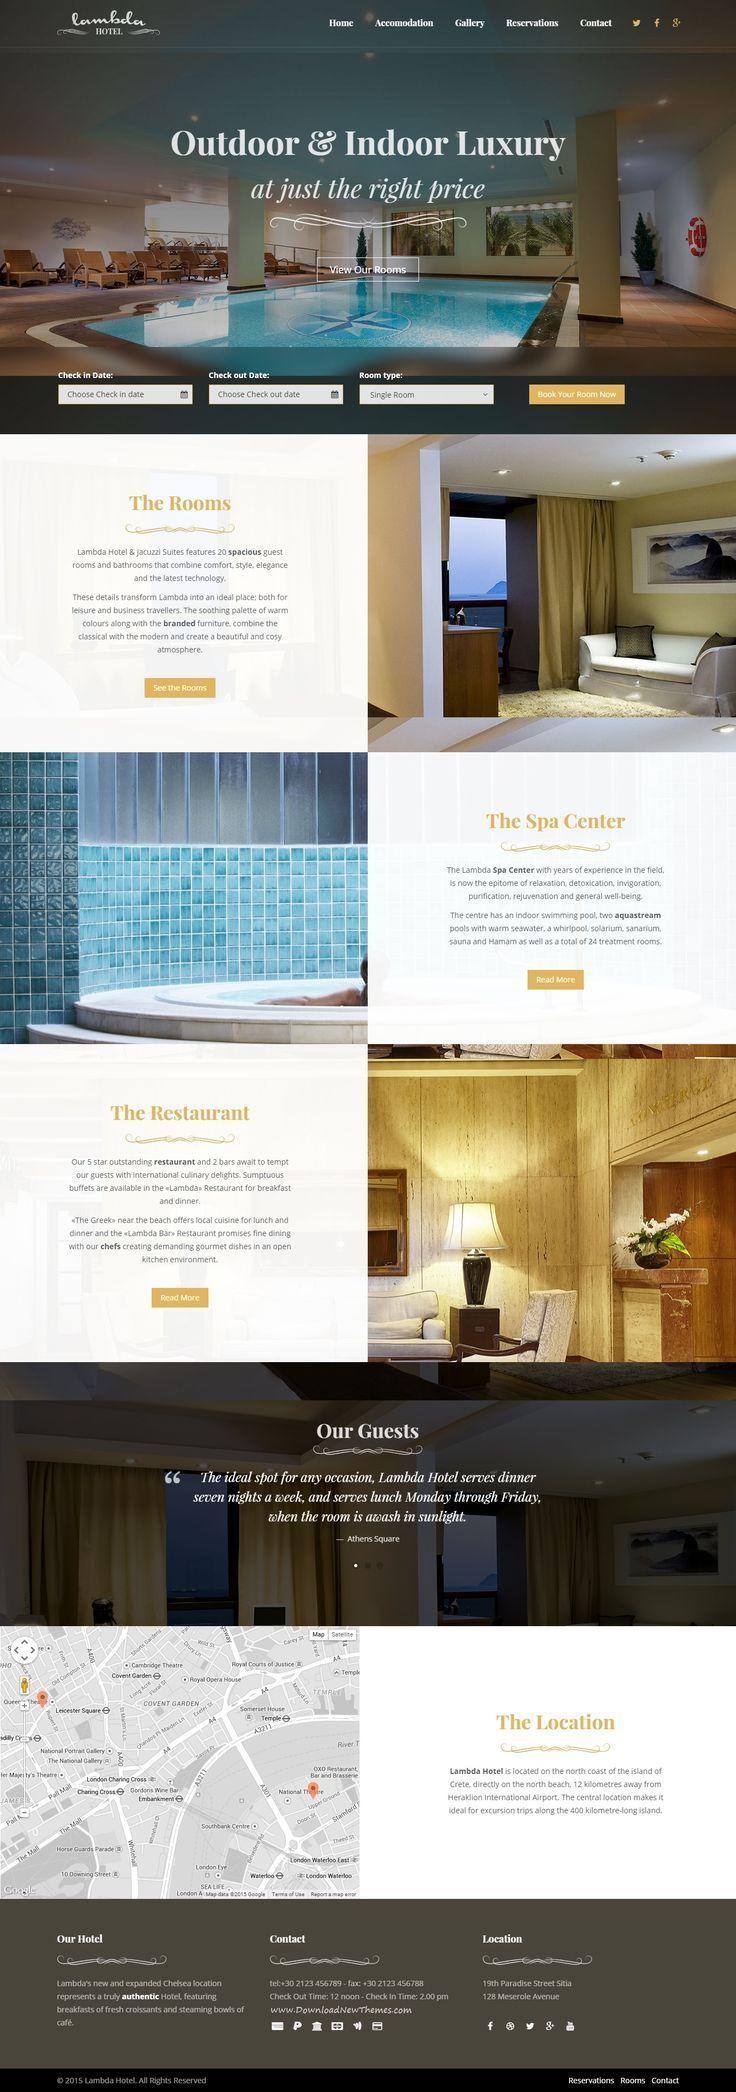 Lambda Is An New Multipurpose Template Super Elegant Design Perfect For A